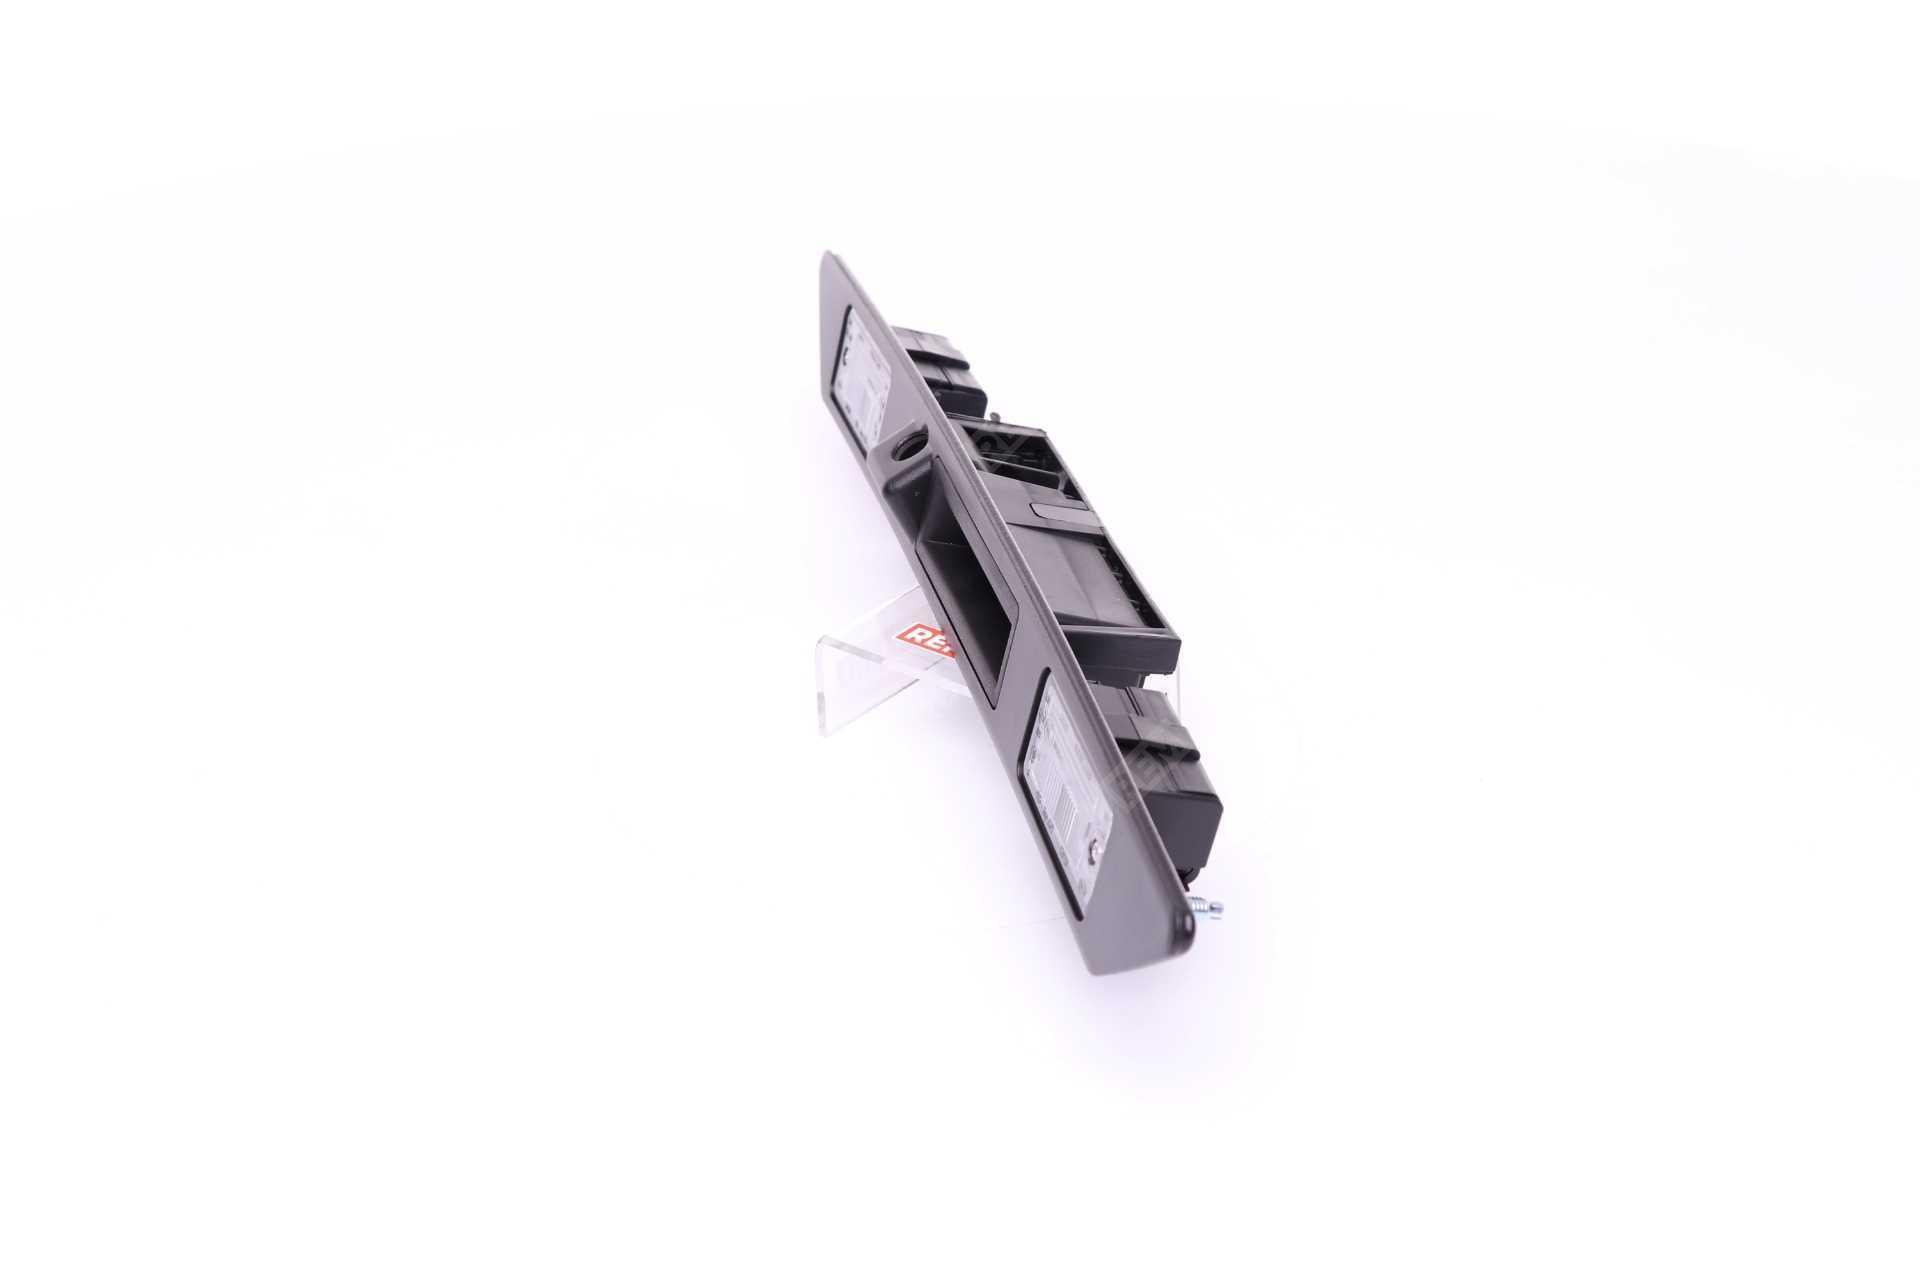 Ручка задней двери 4L08275743FZ